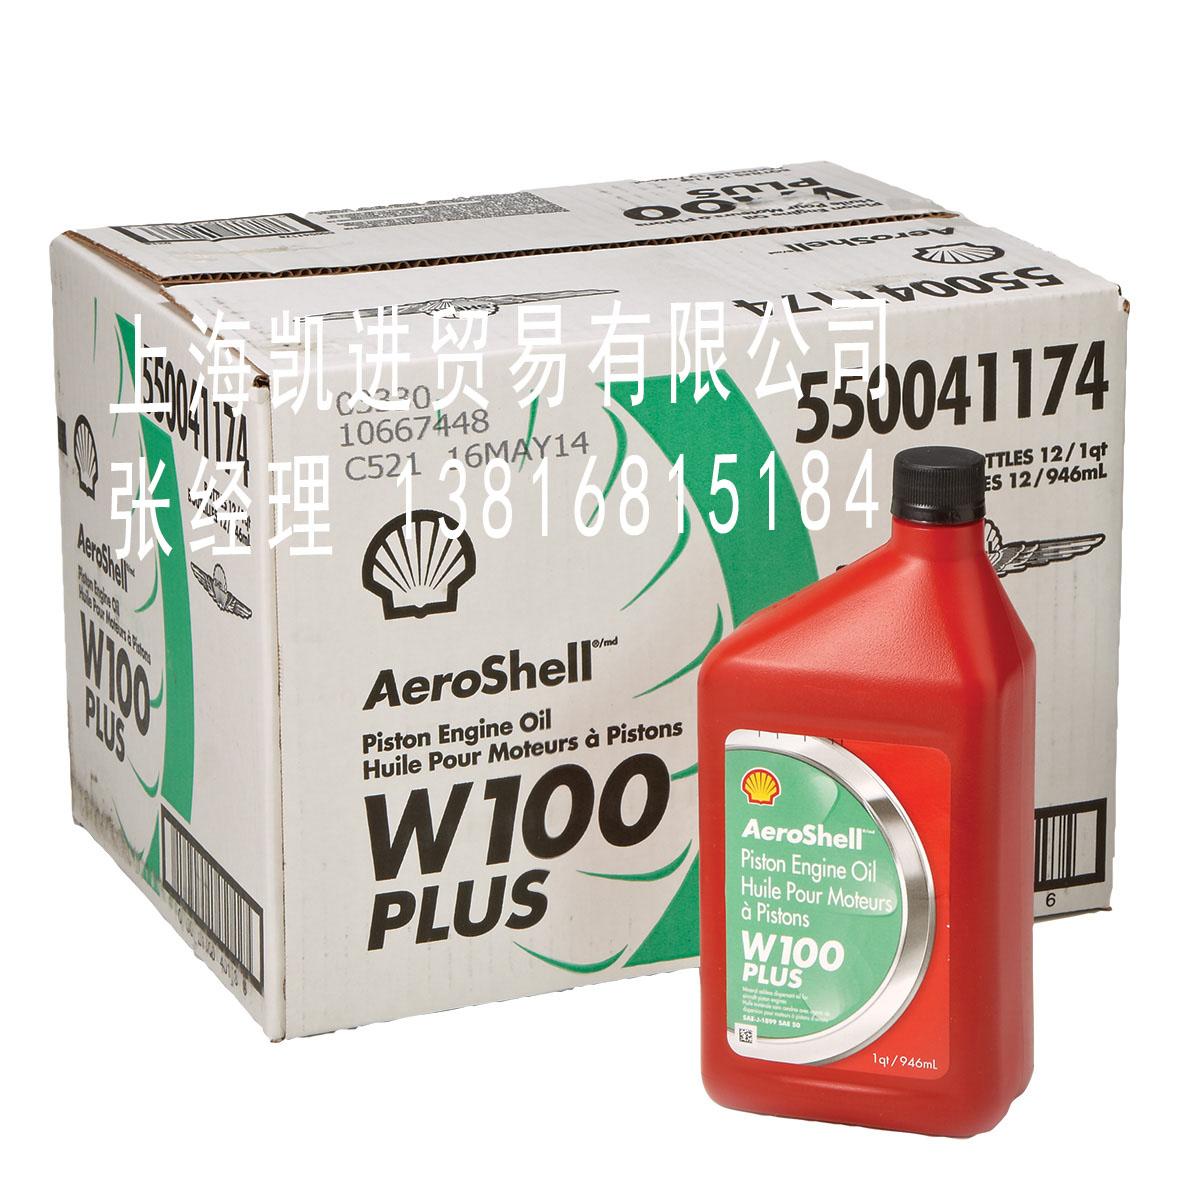 壳牌航空Aeroshell Oil W100 Plus四冲程内燃机油